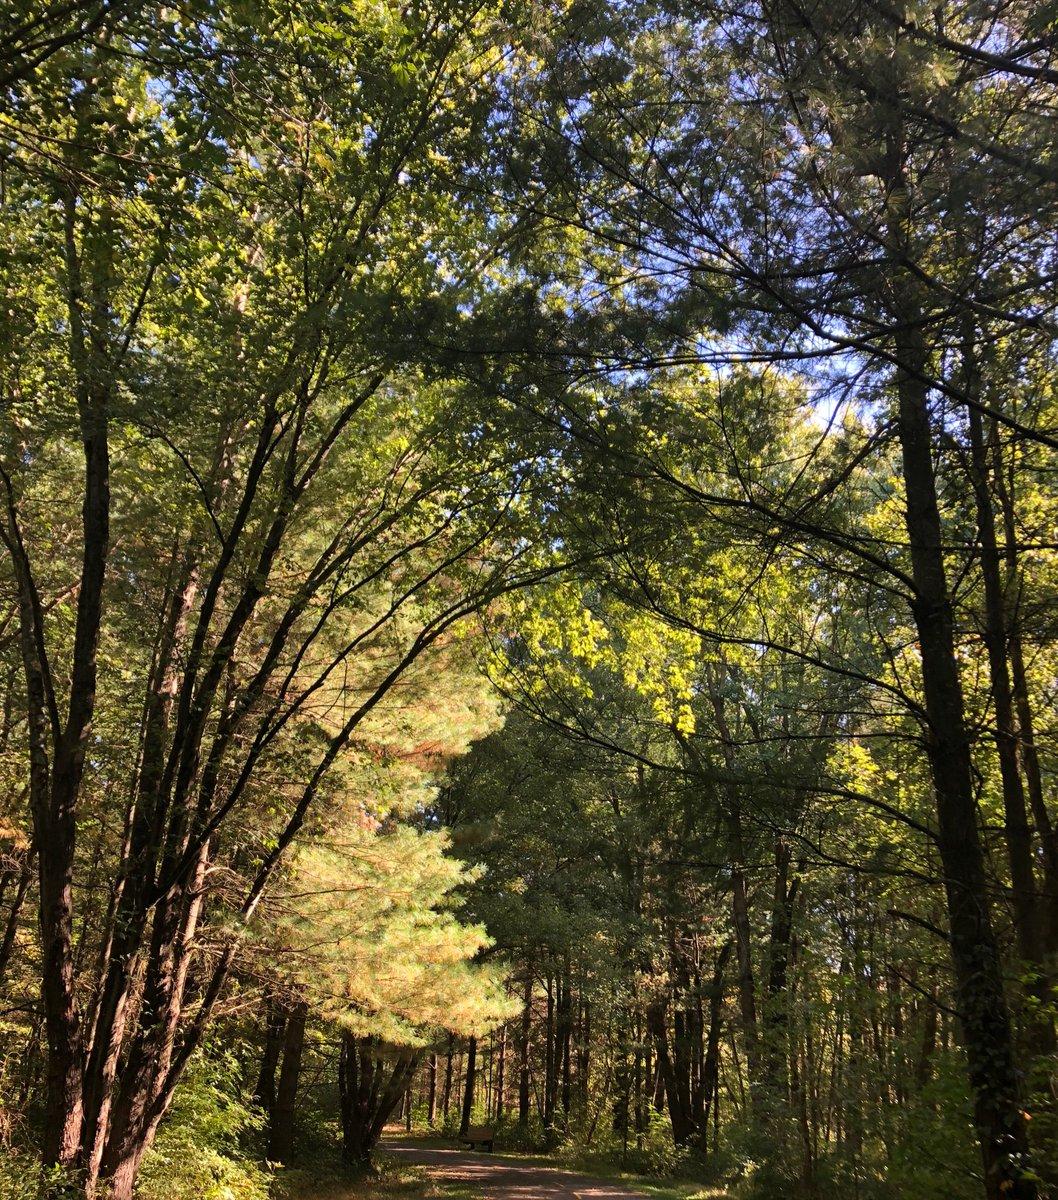 test Twitter Media - RT @MilliganPhD: Beautiful hike with CAHS Adventure Club @CbusMetroParks  @cahsmicpower  #3creeks https://t.co/fkBhqSTwDP